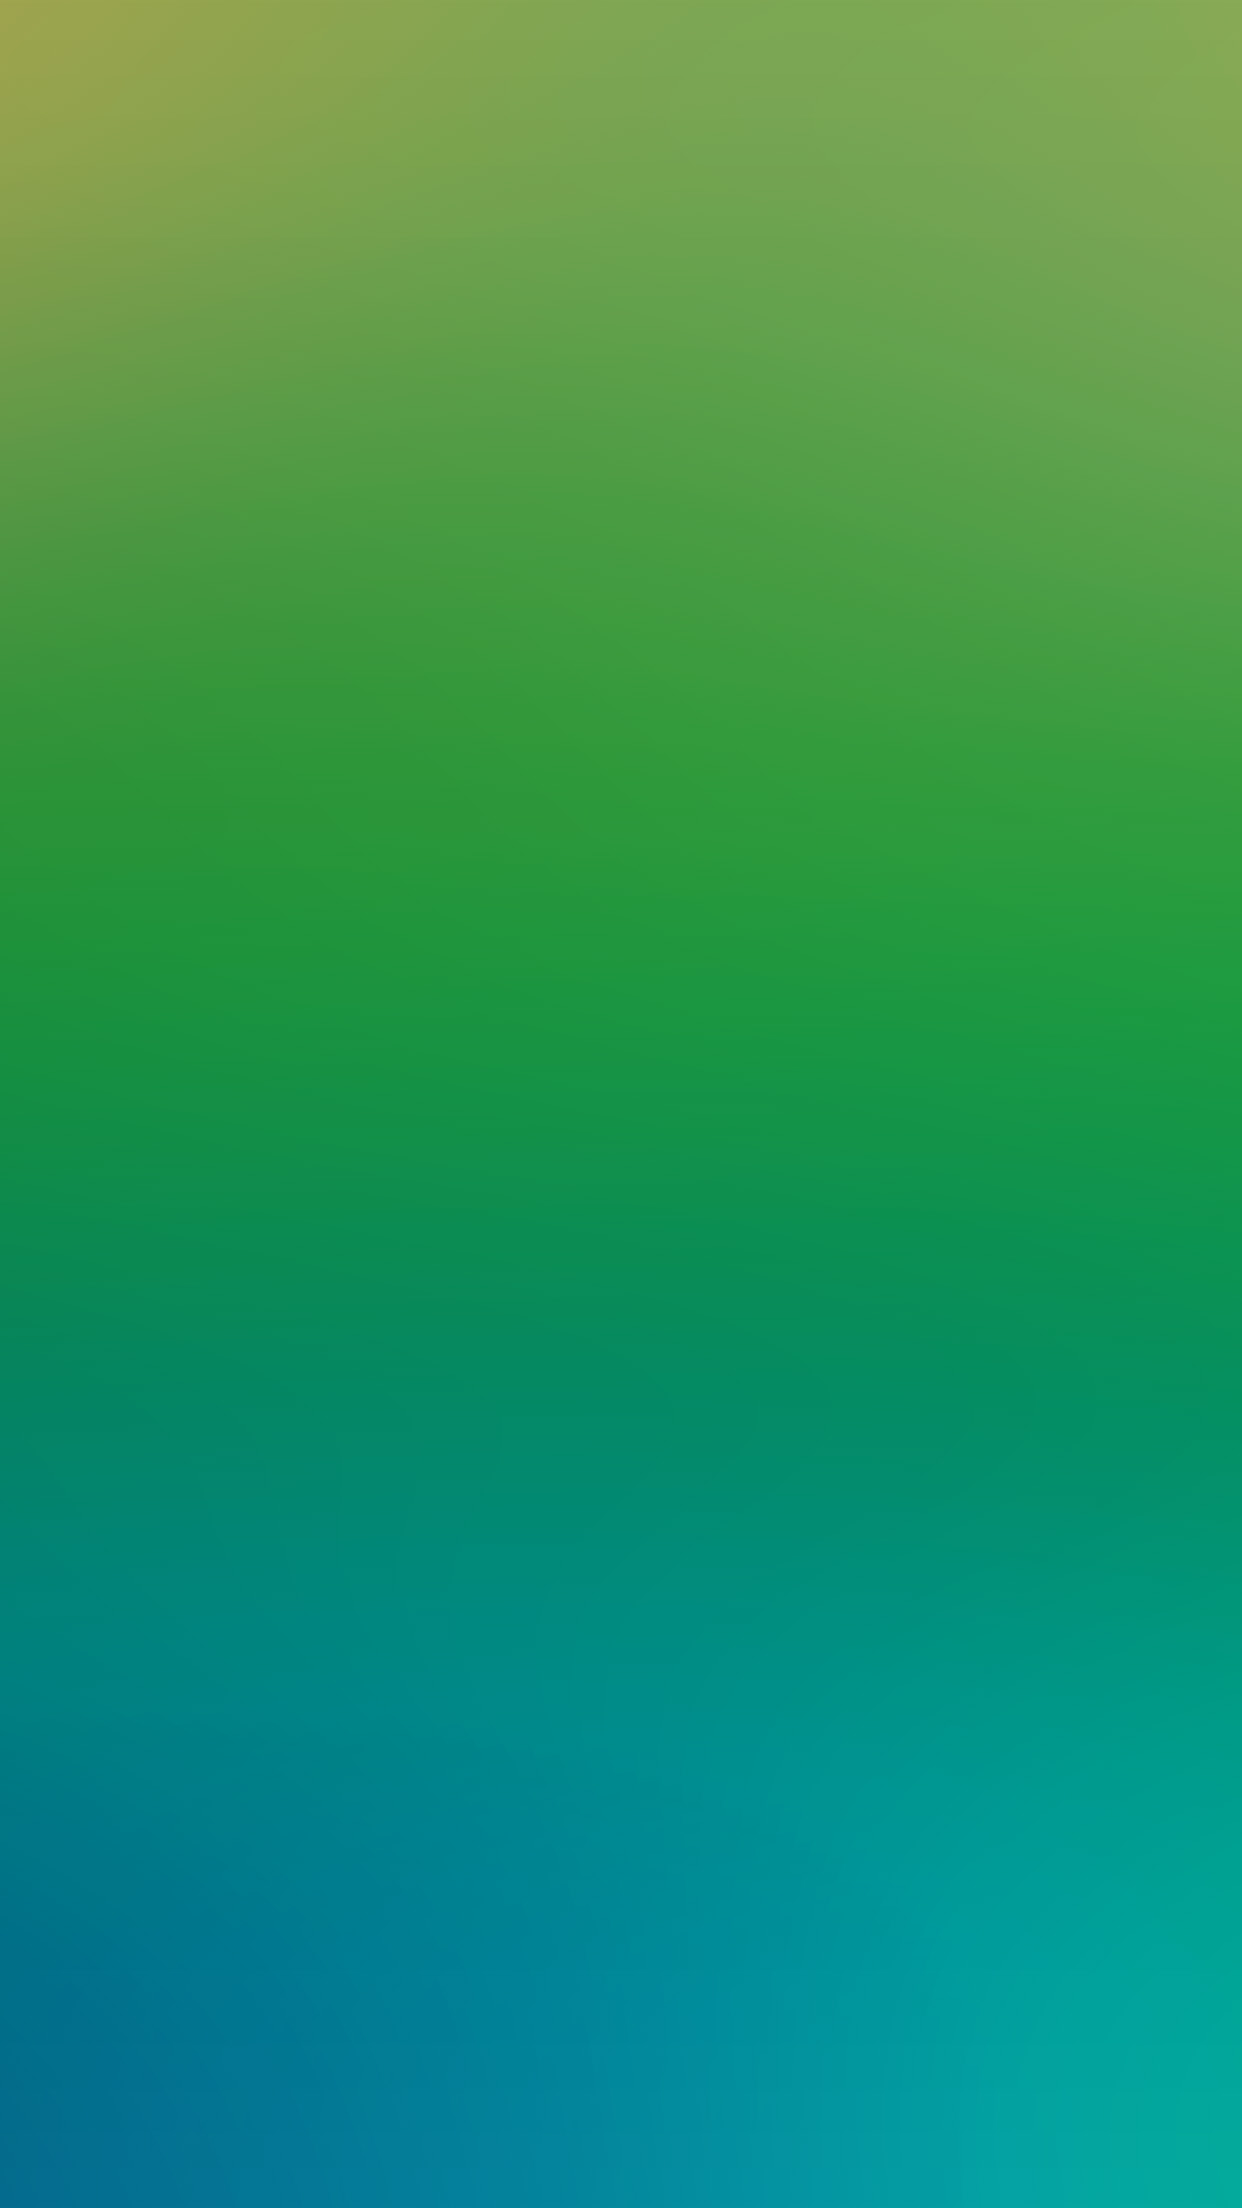 sl09softbluegreenwoodblurgradationwallpaper